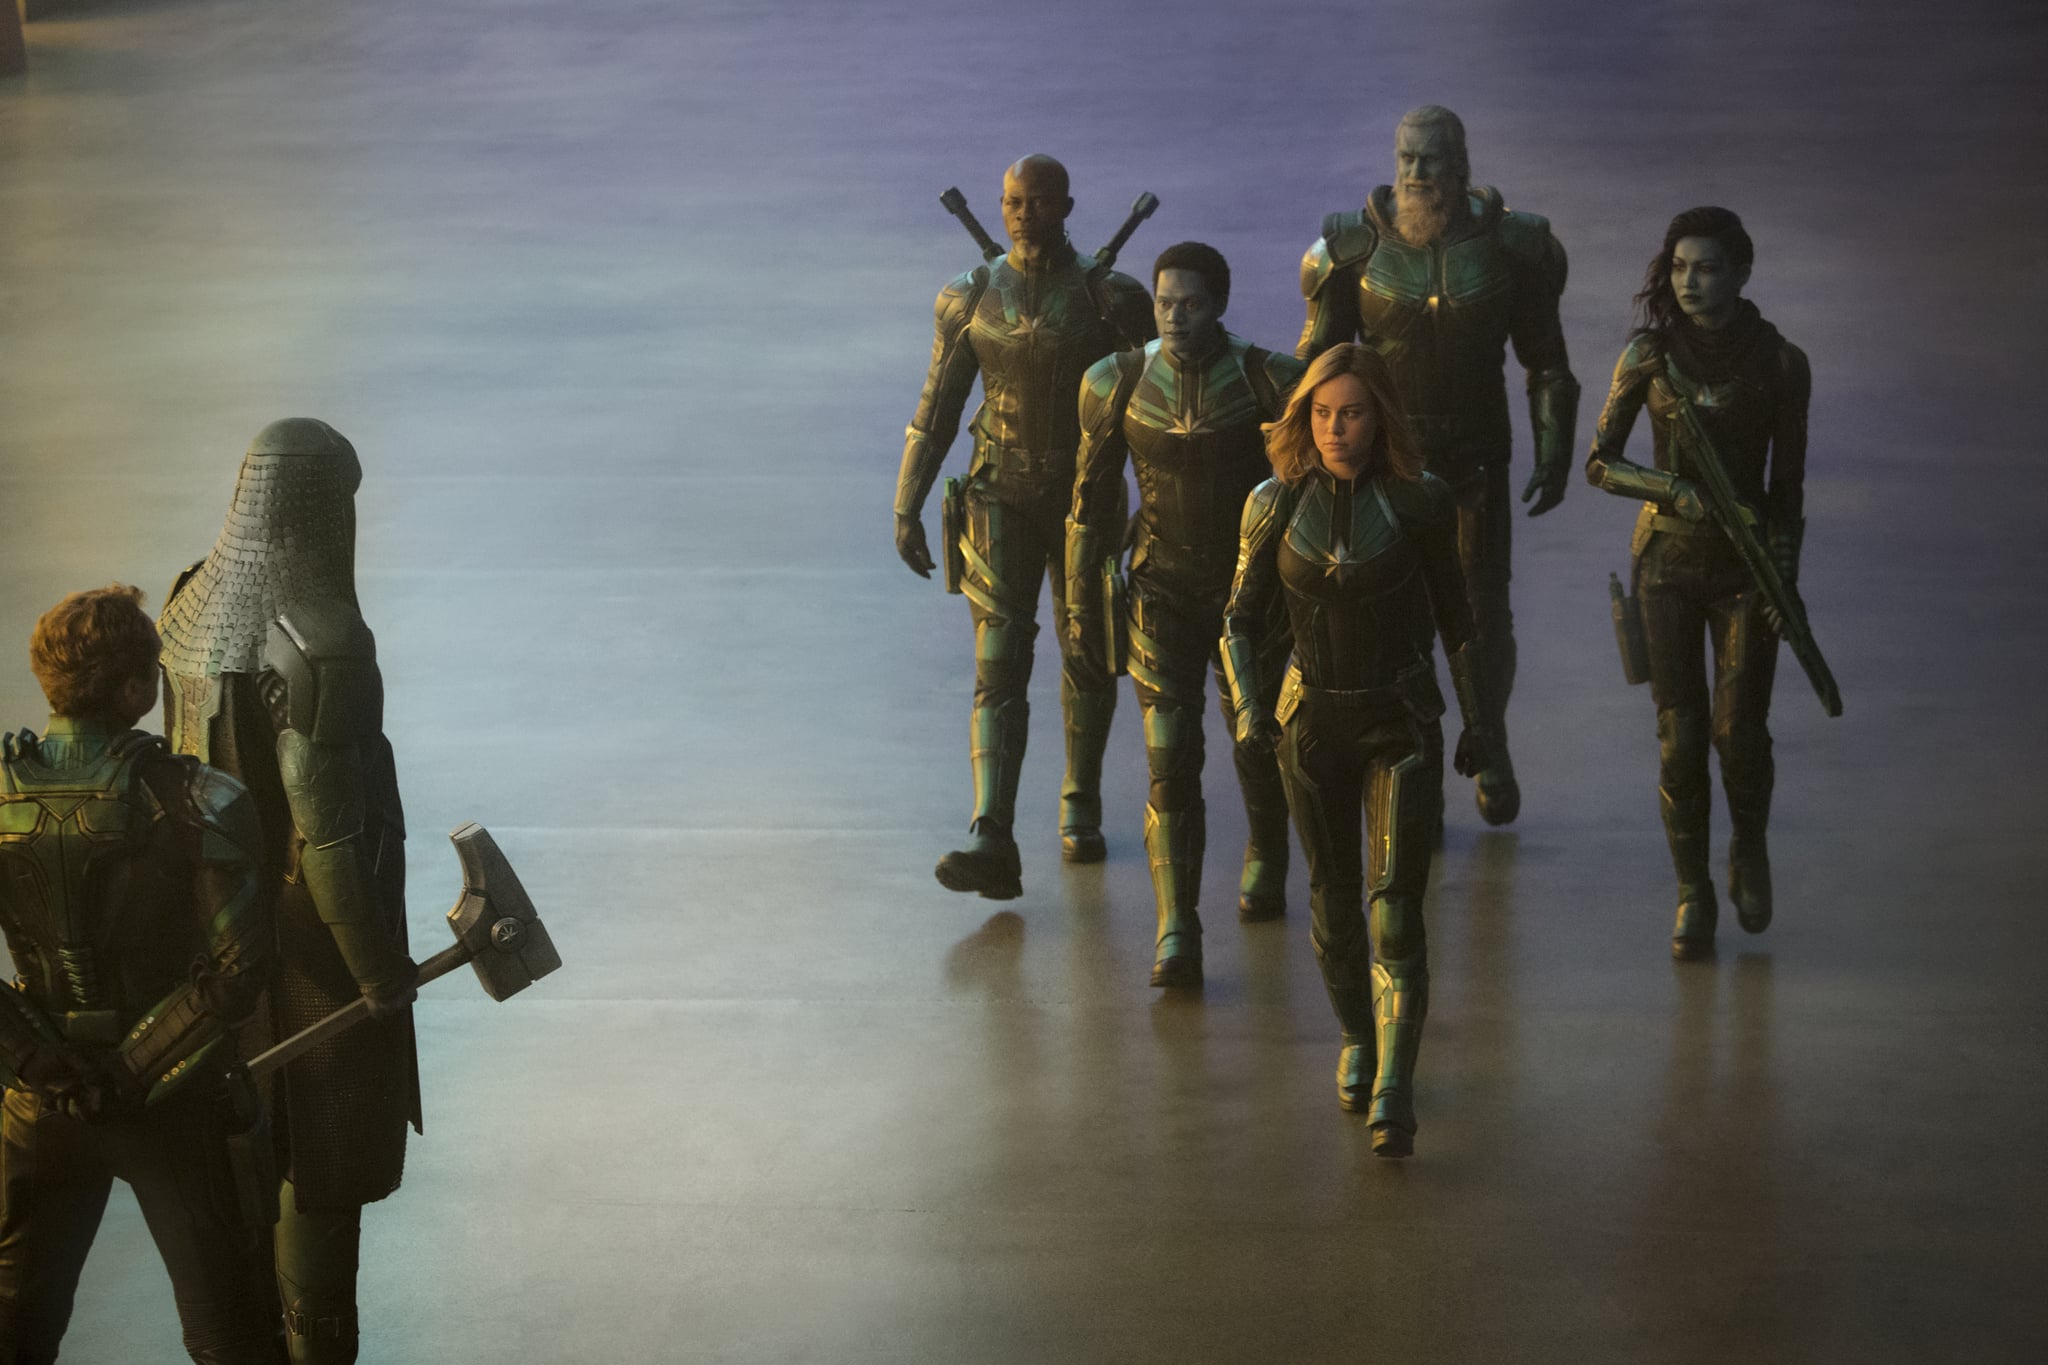 Marvel Studios' CAPTAIN MARVEL..L to R: Leader of Starforce (Jude Law), Ronan (Lee Pace), Korath (Djimon Hounsou), Att-Lass (Algenis Perez Soto), Carol Danvers/Captain Marvel (Brie Larson), Bron-Char (Rune Temte) and Minn-Erva (Gemma Chan)..Photo: Chuck Zlotnick..©Marvel Studios 2019